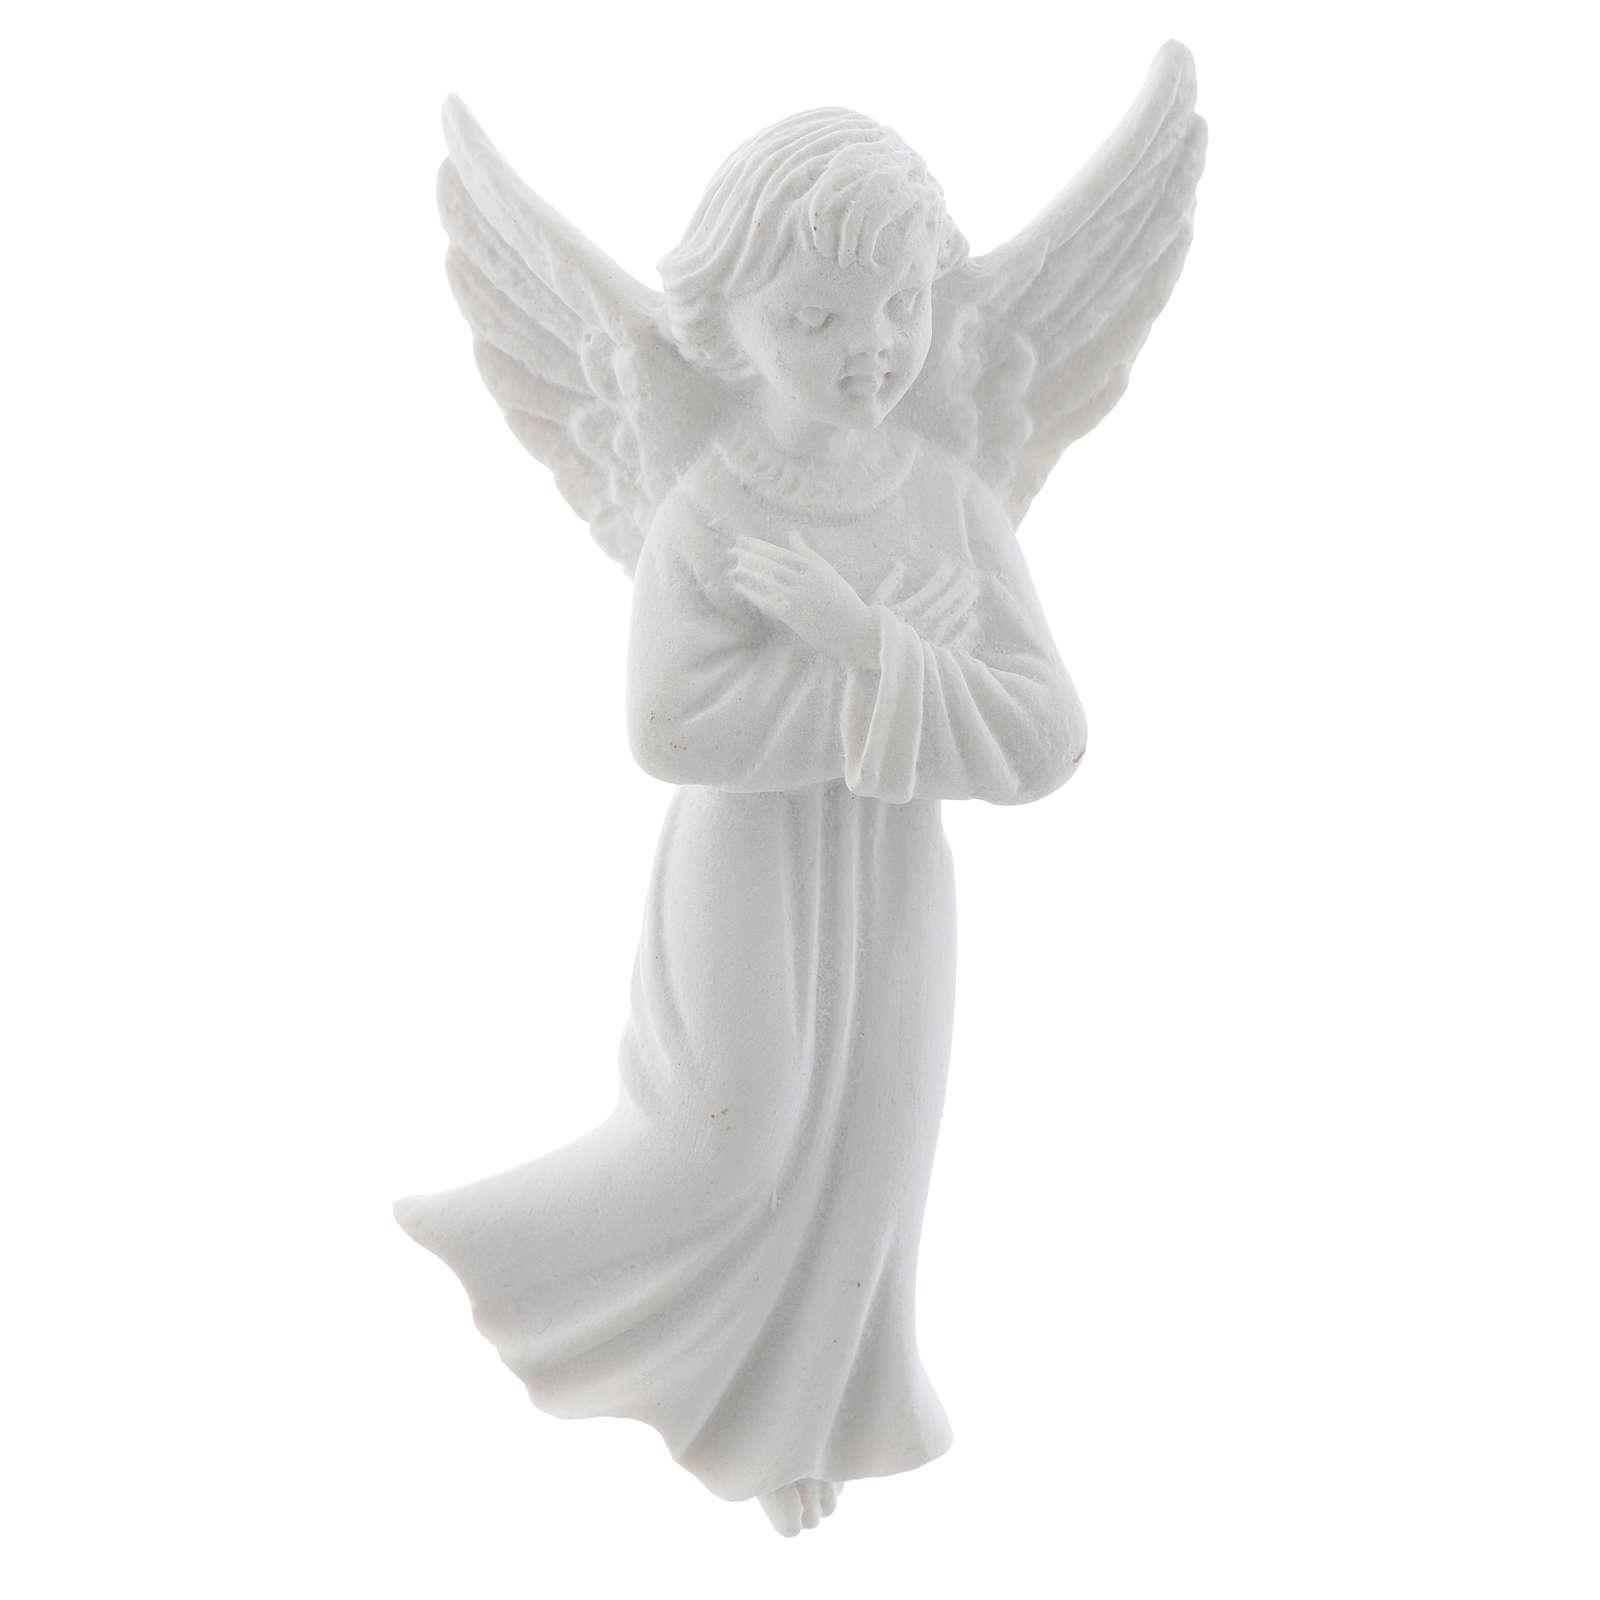 Angelo con mani incrociate 11 cm rilievo marmo 3